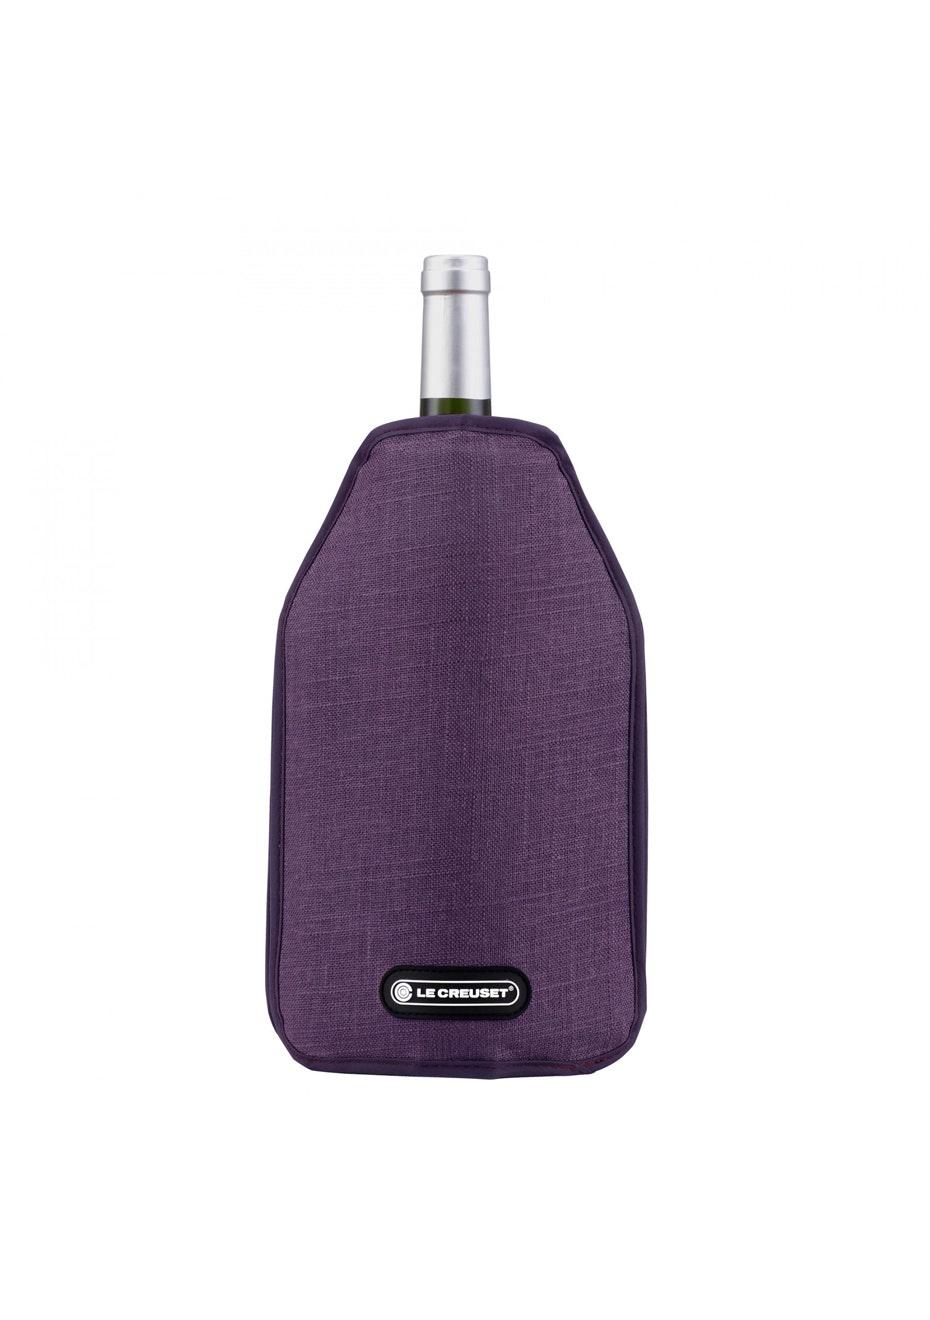 Le Creuset - Wine Cooler Sleeve - Amethyst